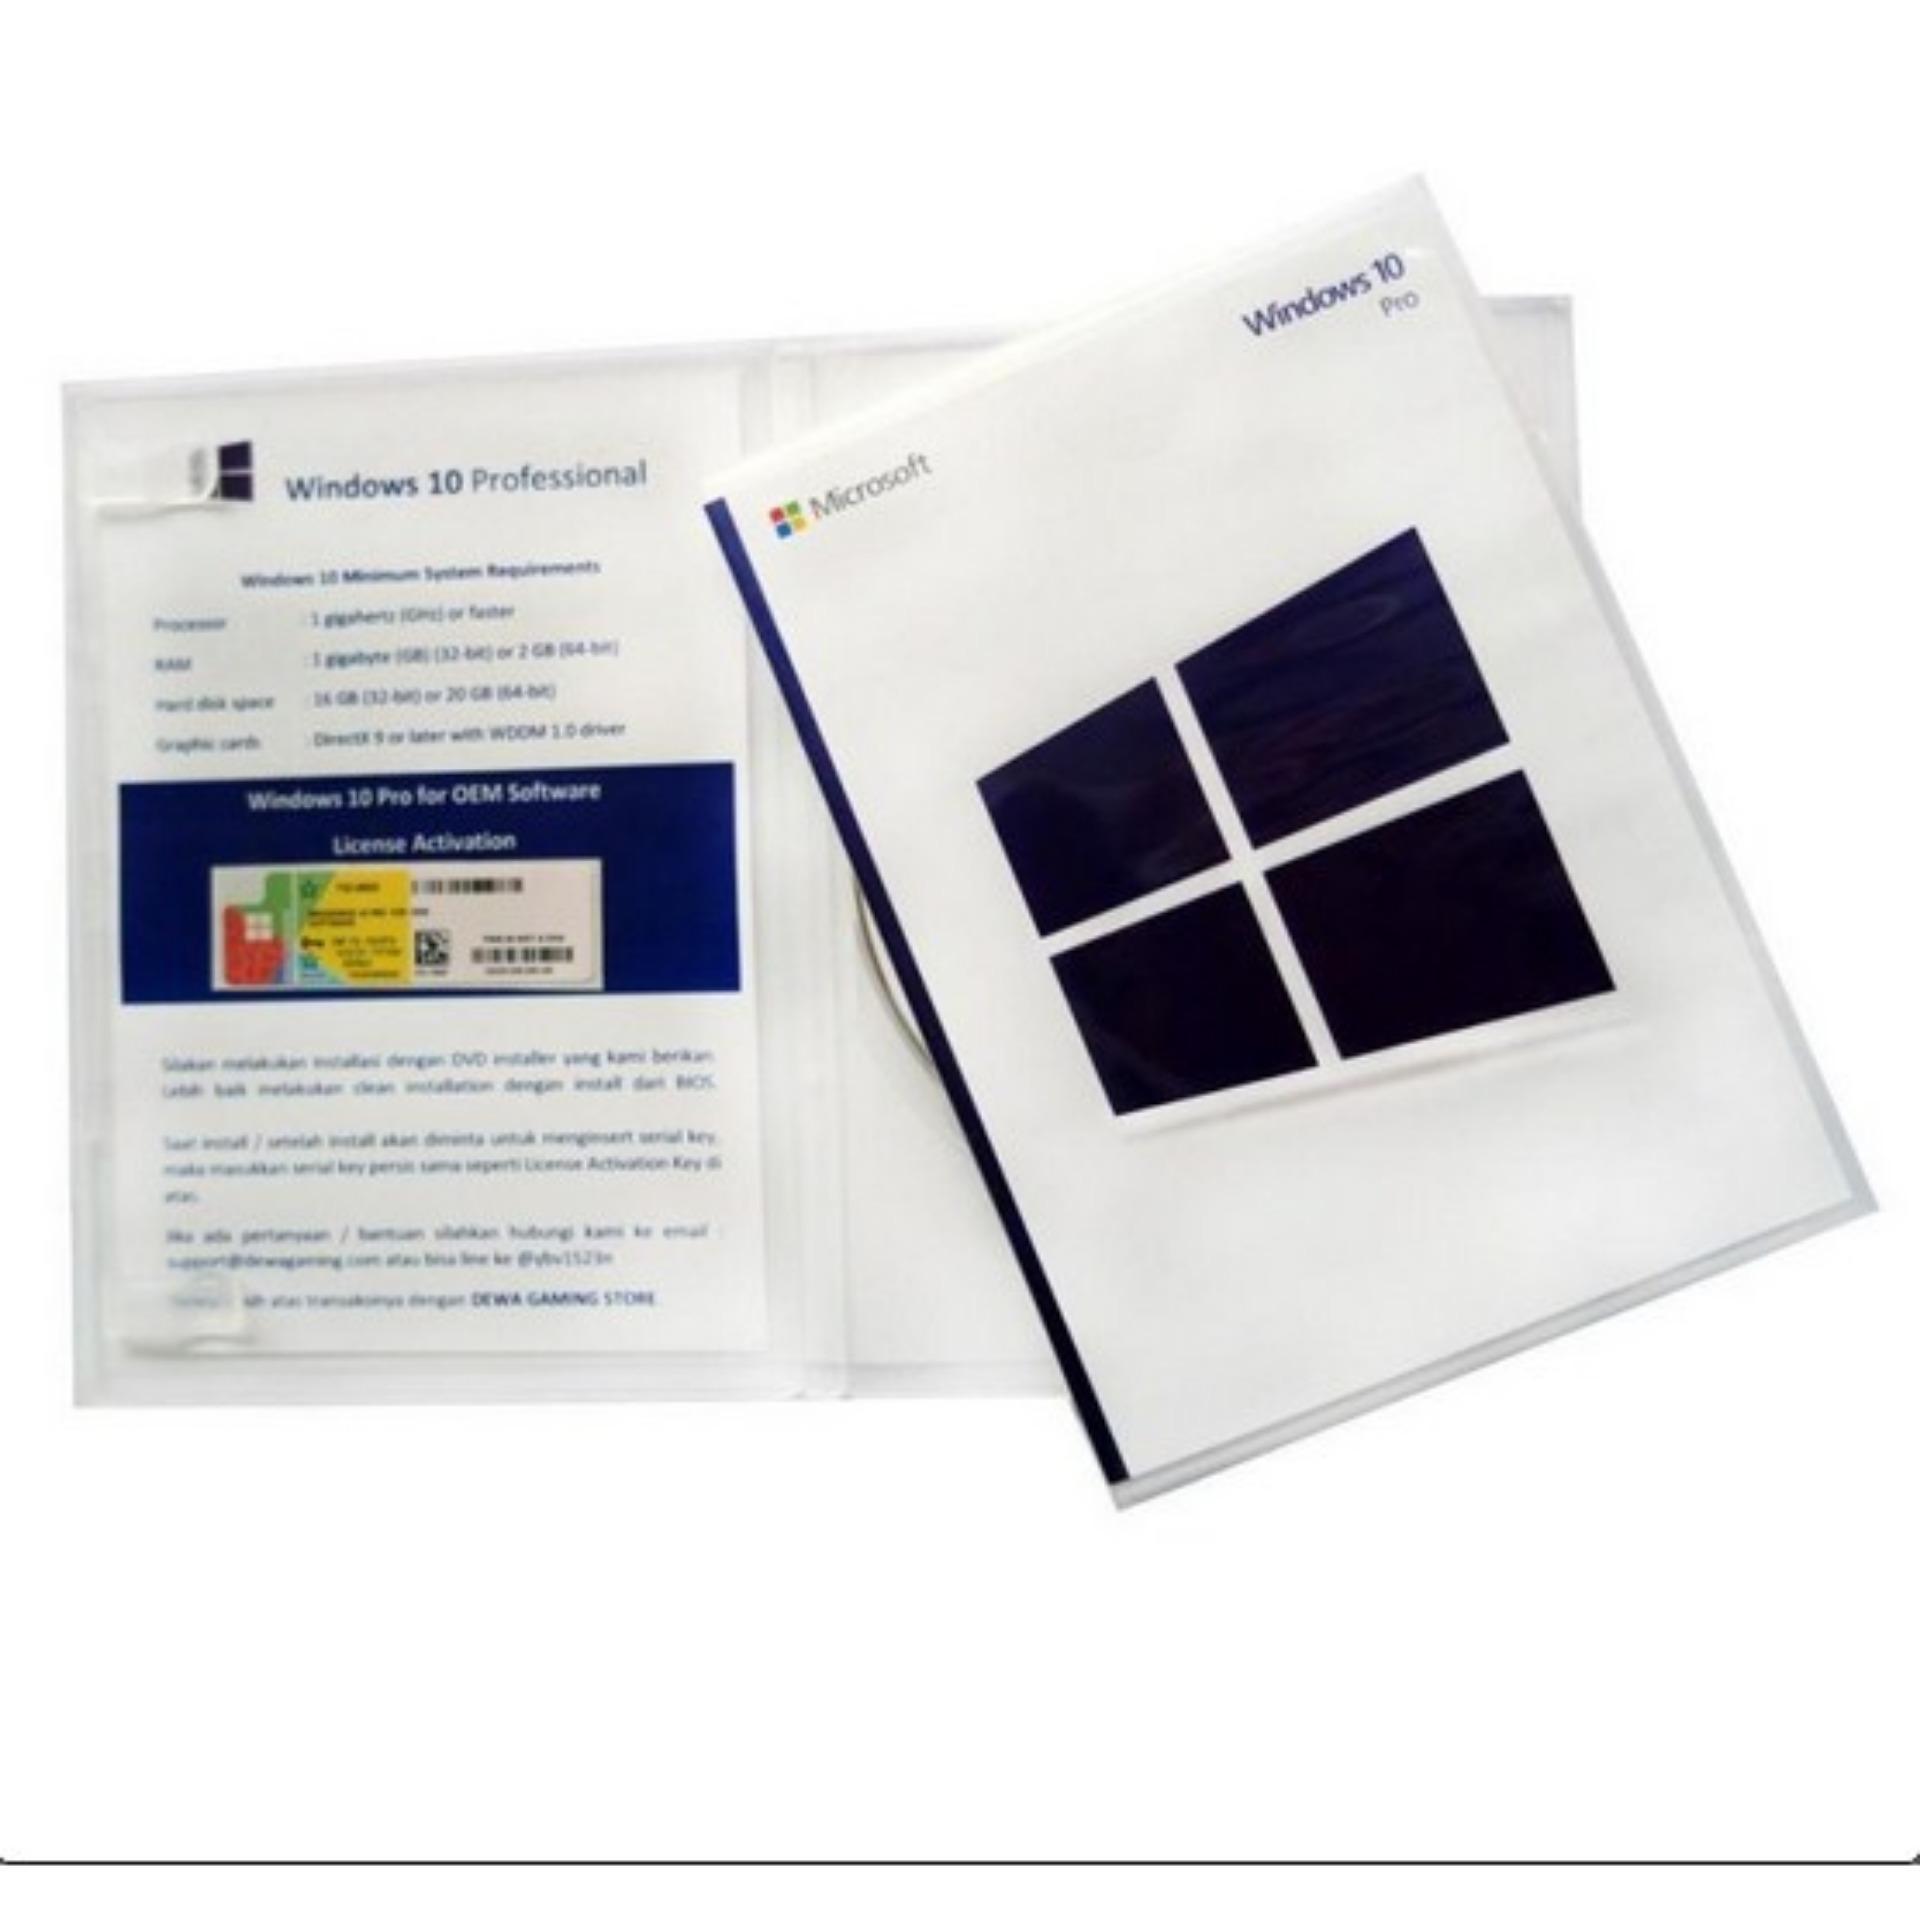 Online Murah Lisensi Coa Windows 10 Professional Oem Dvd Box Pro